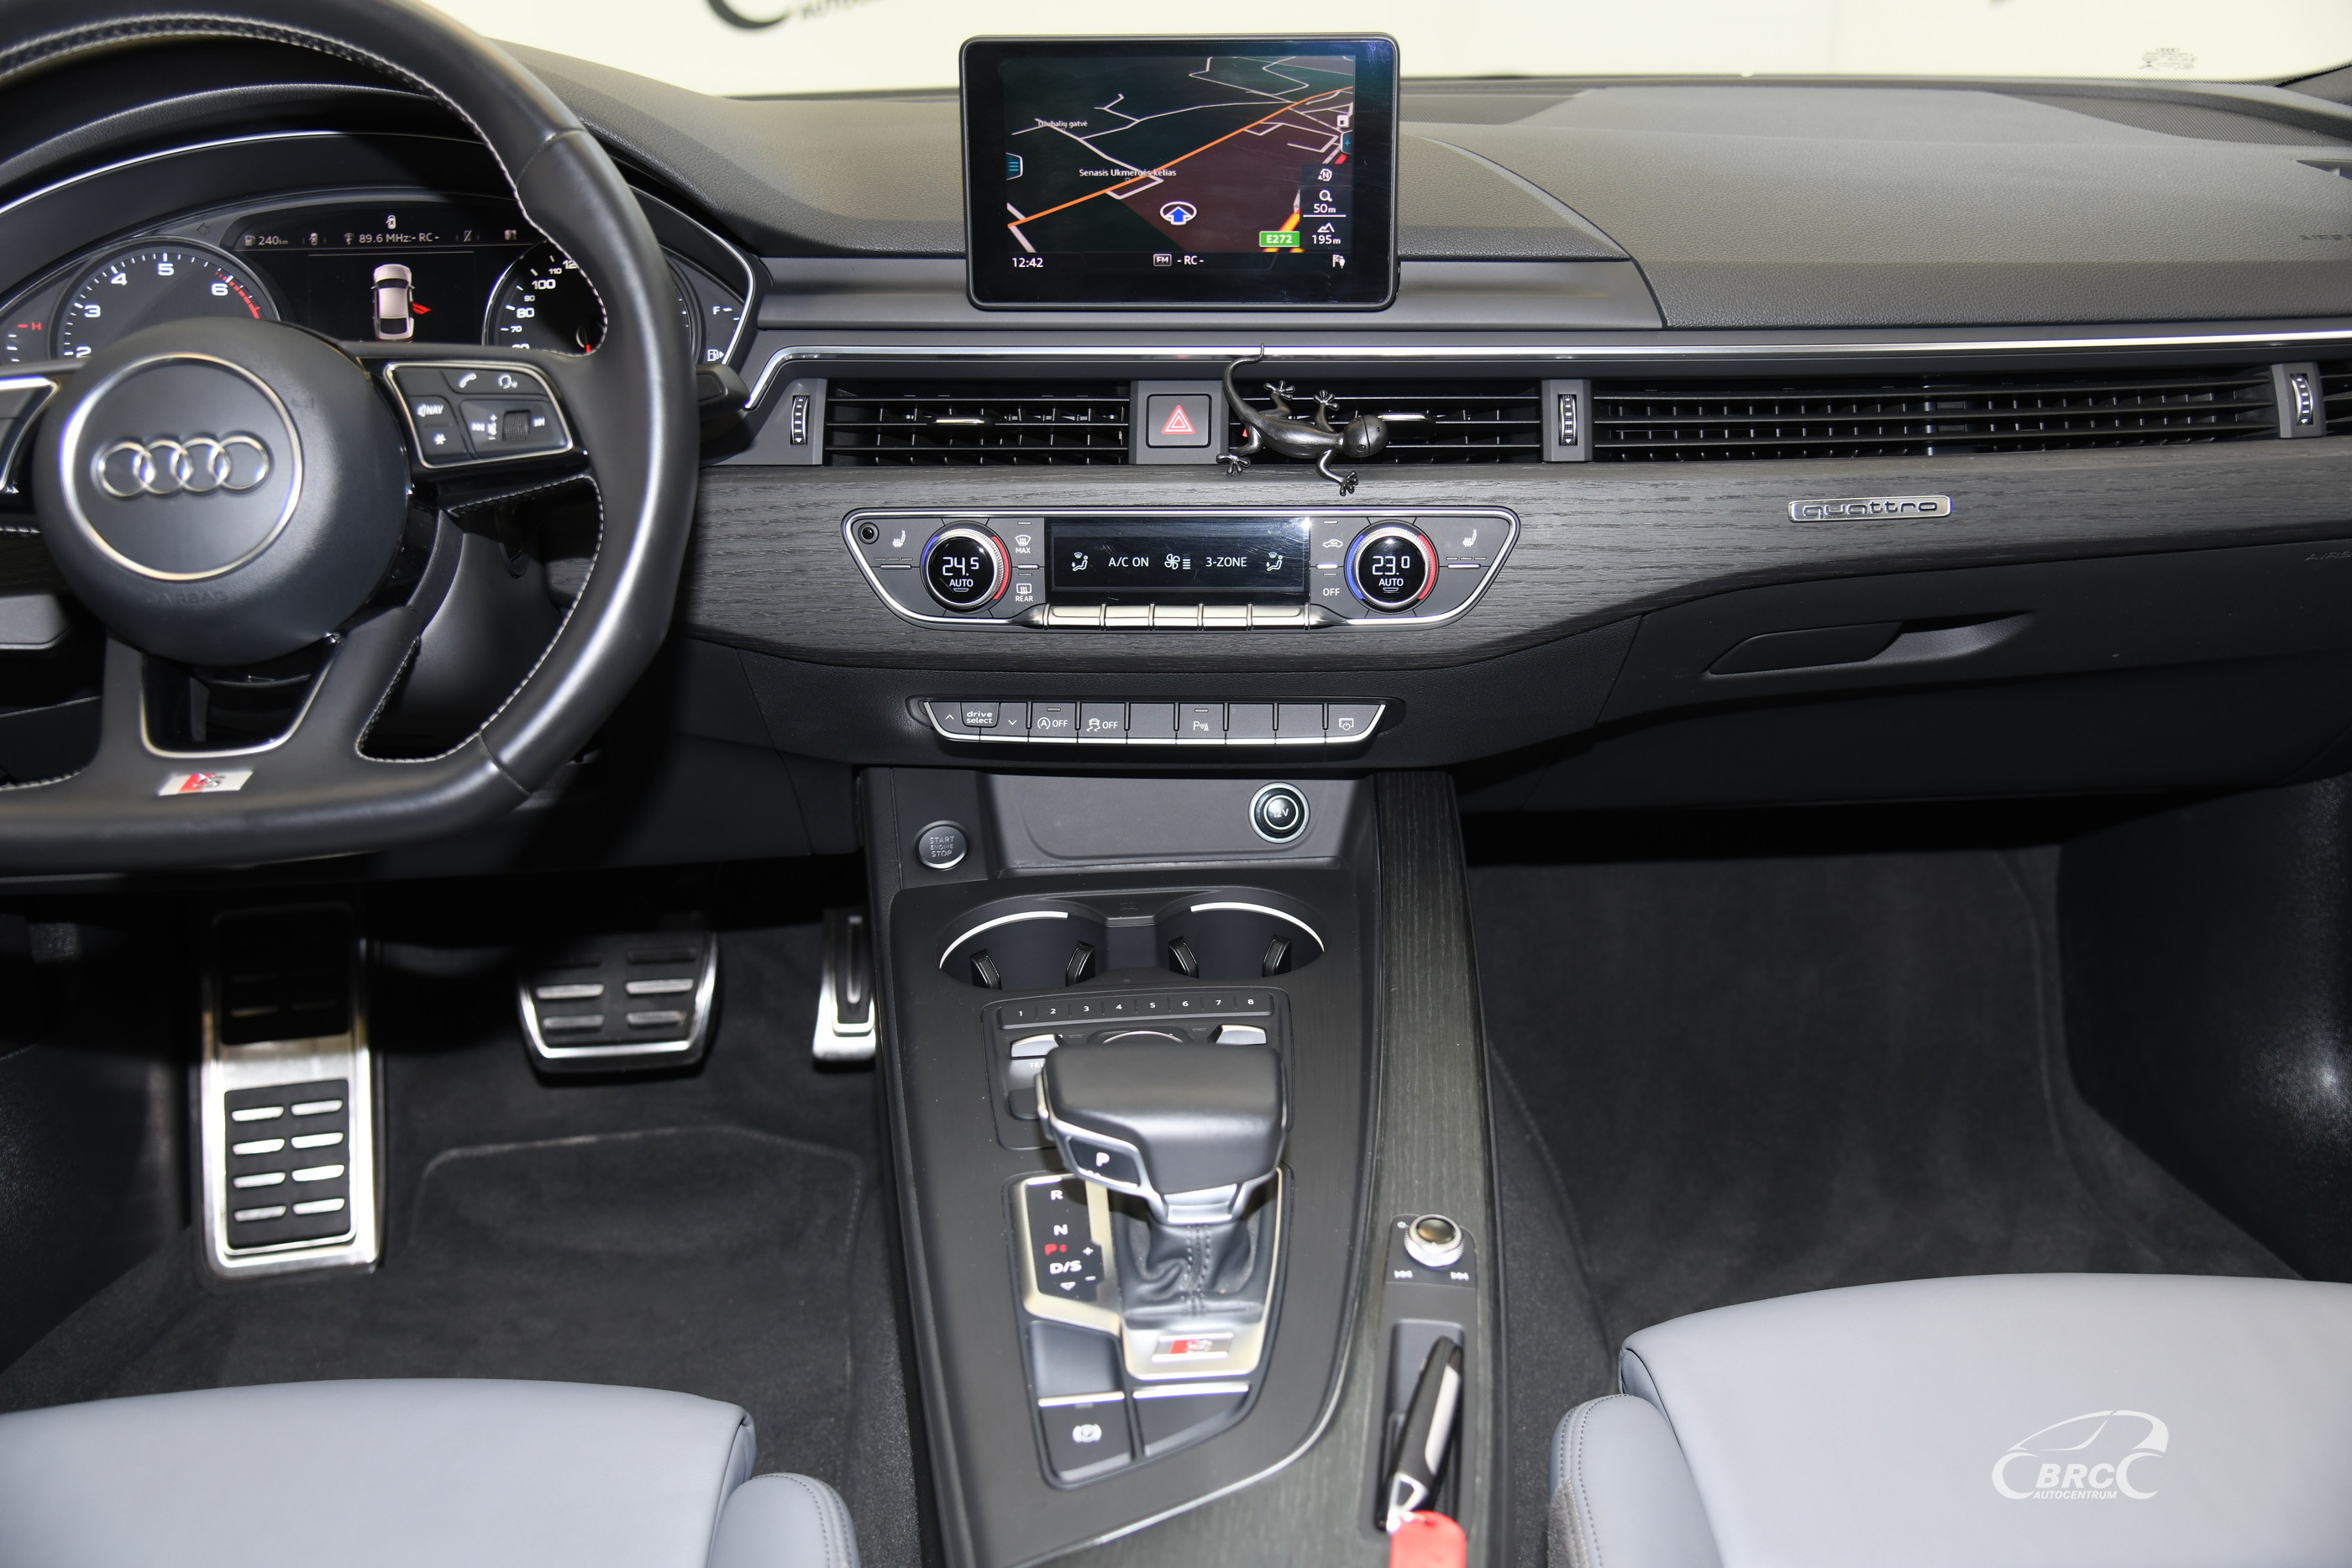 Audi A5 Sportback 2.0 TFSI Quattro S-line Automatas